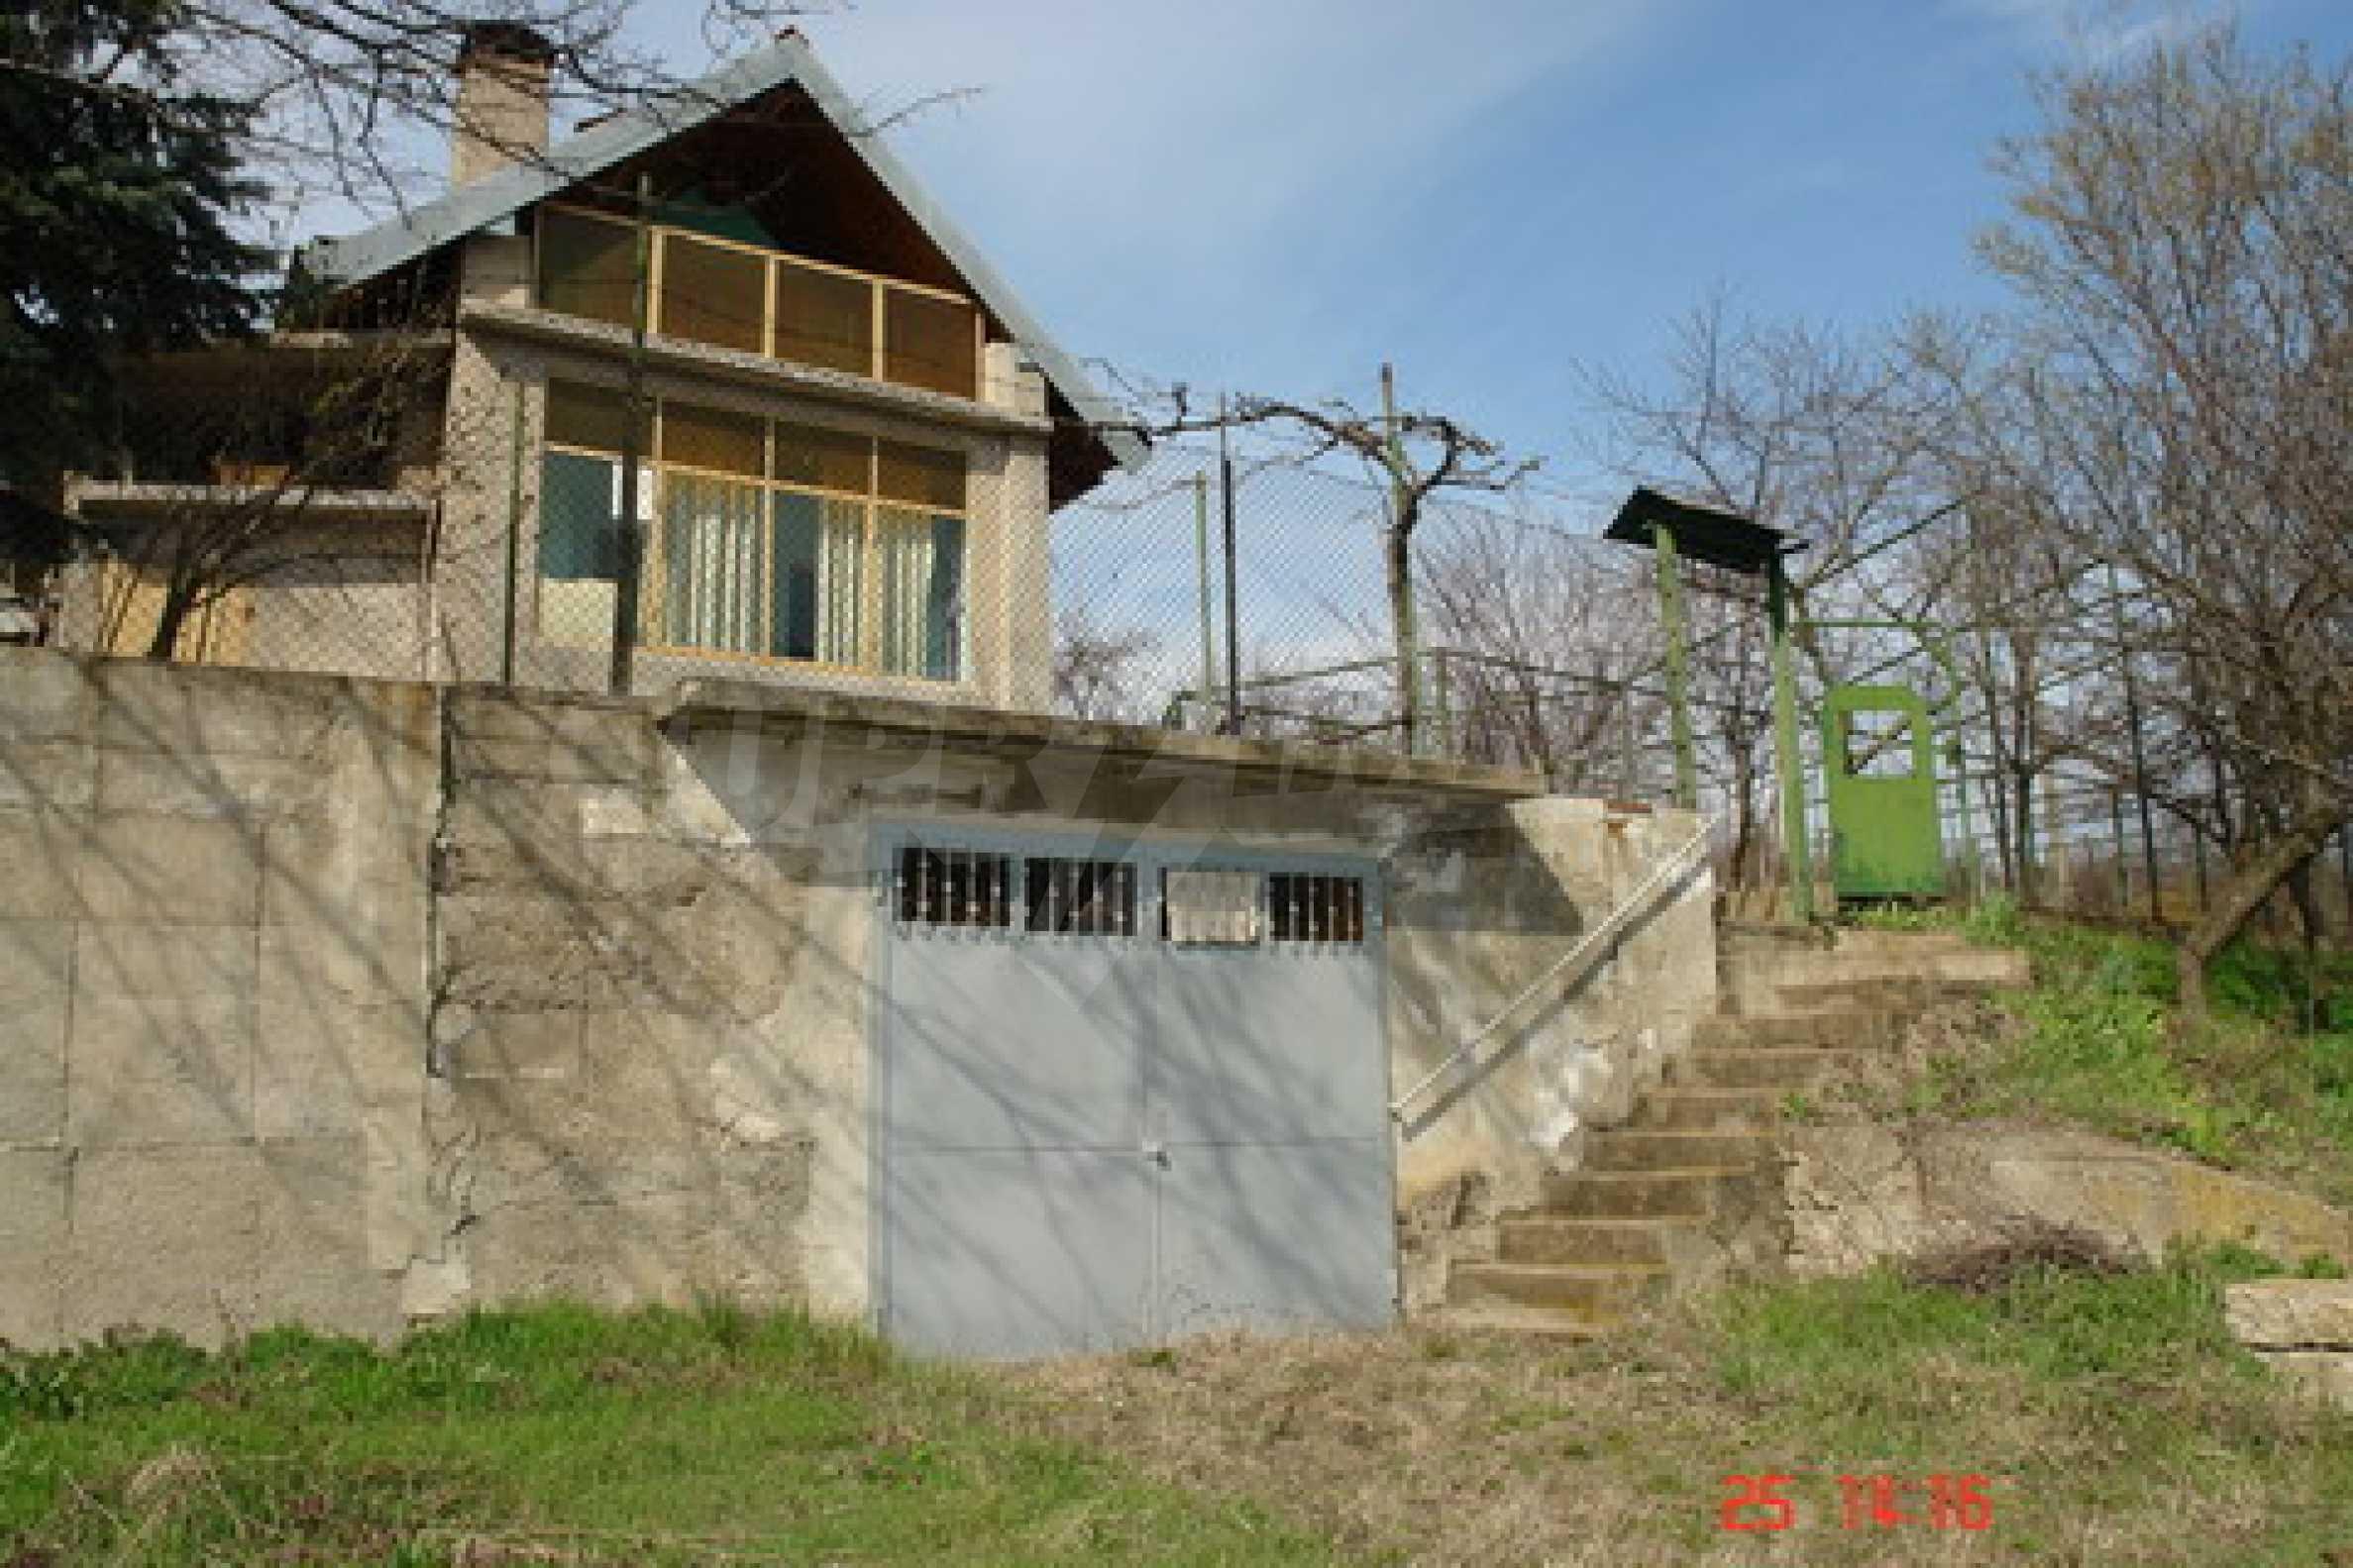 Haus an der Hauptstraße Ruse Sofia 1